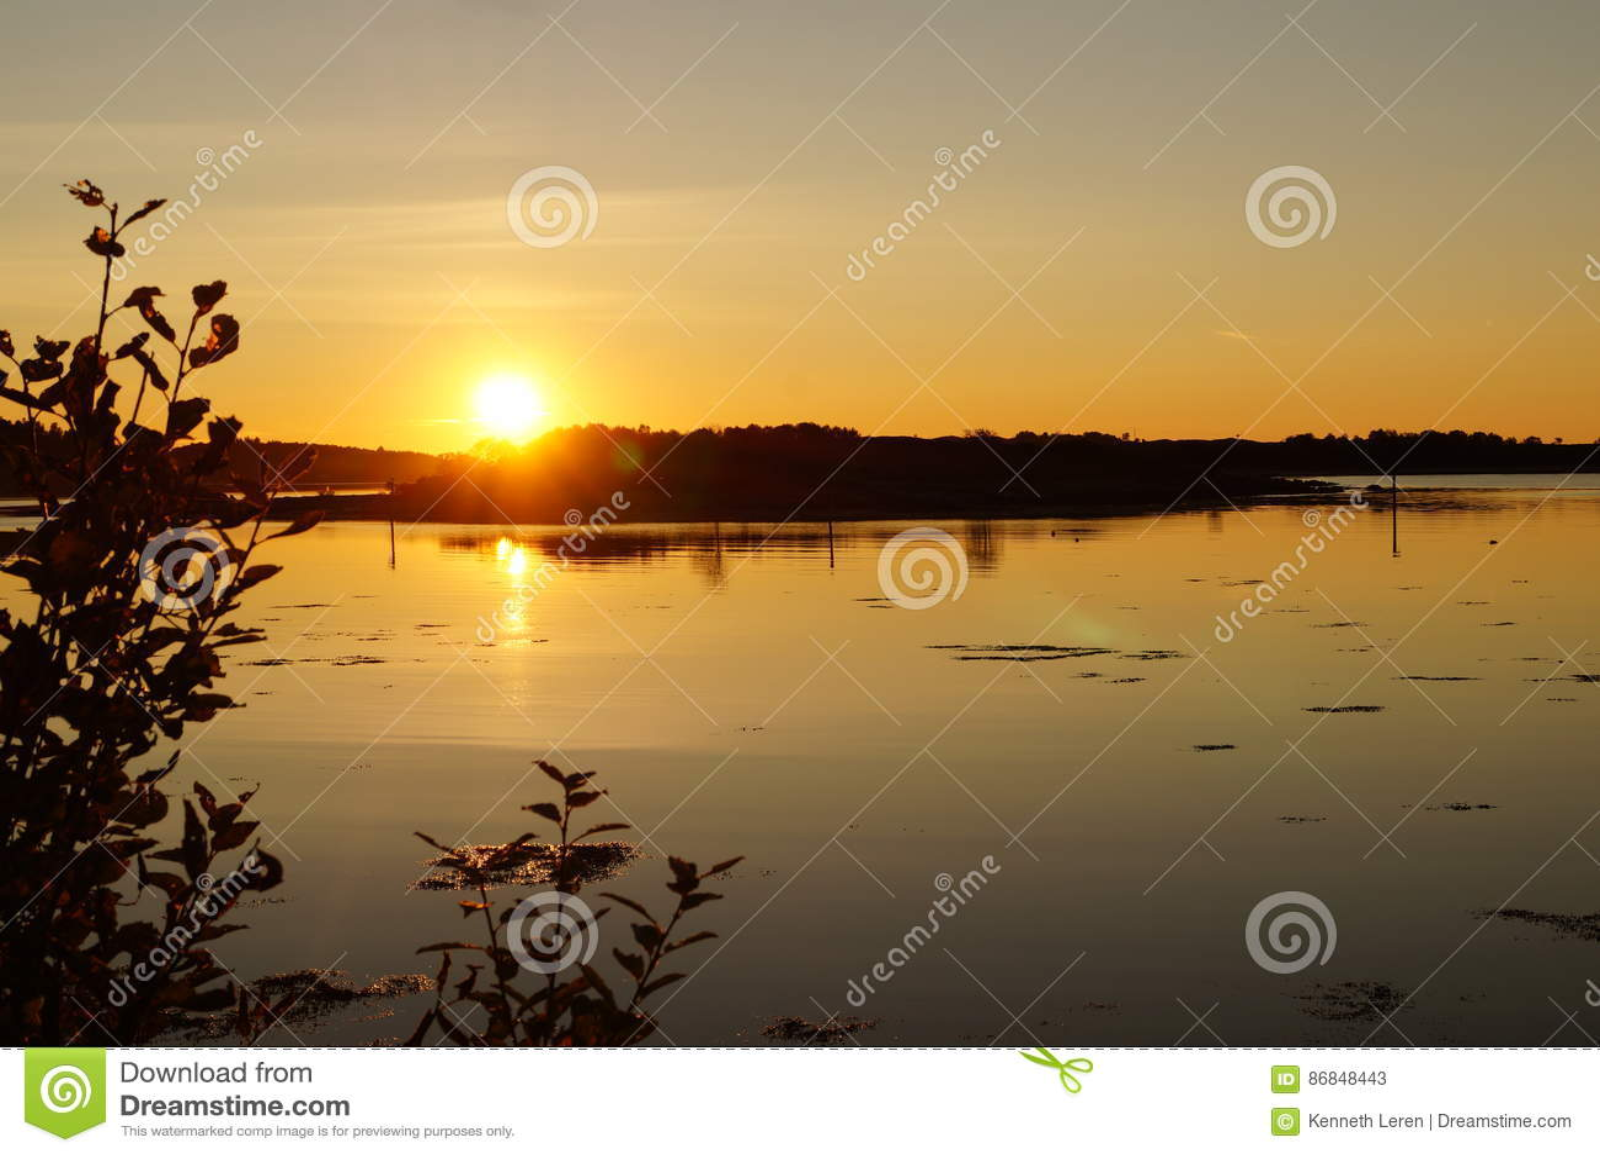 Leren Bank Summer.Coast By Nightfall Norway Stock Image Image Of Sunset